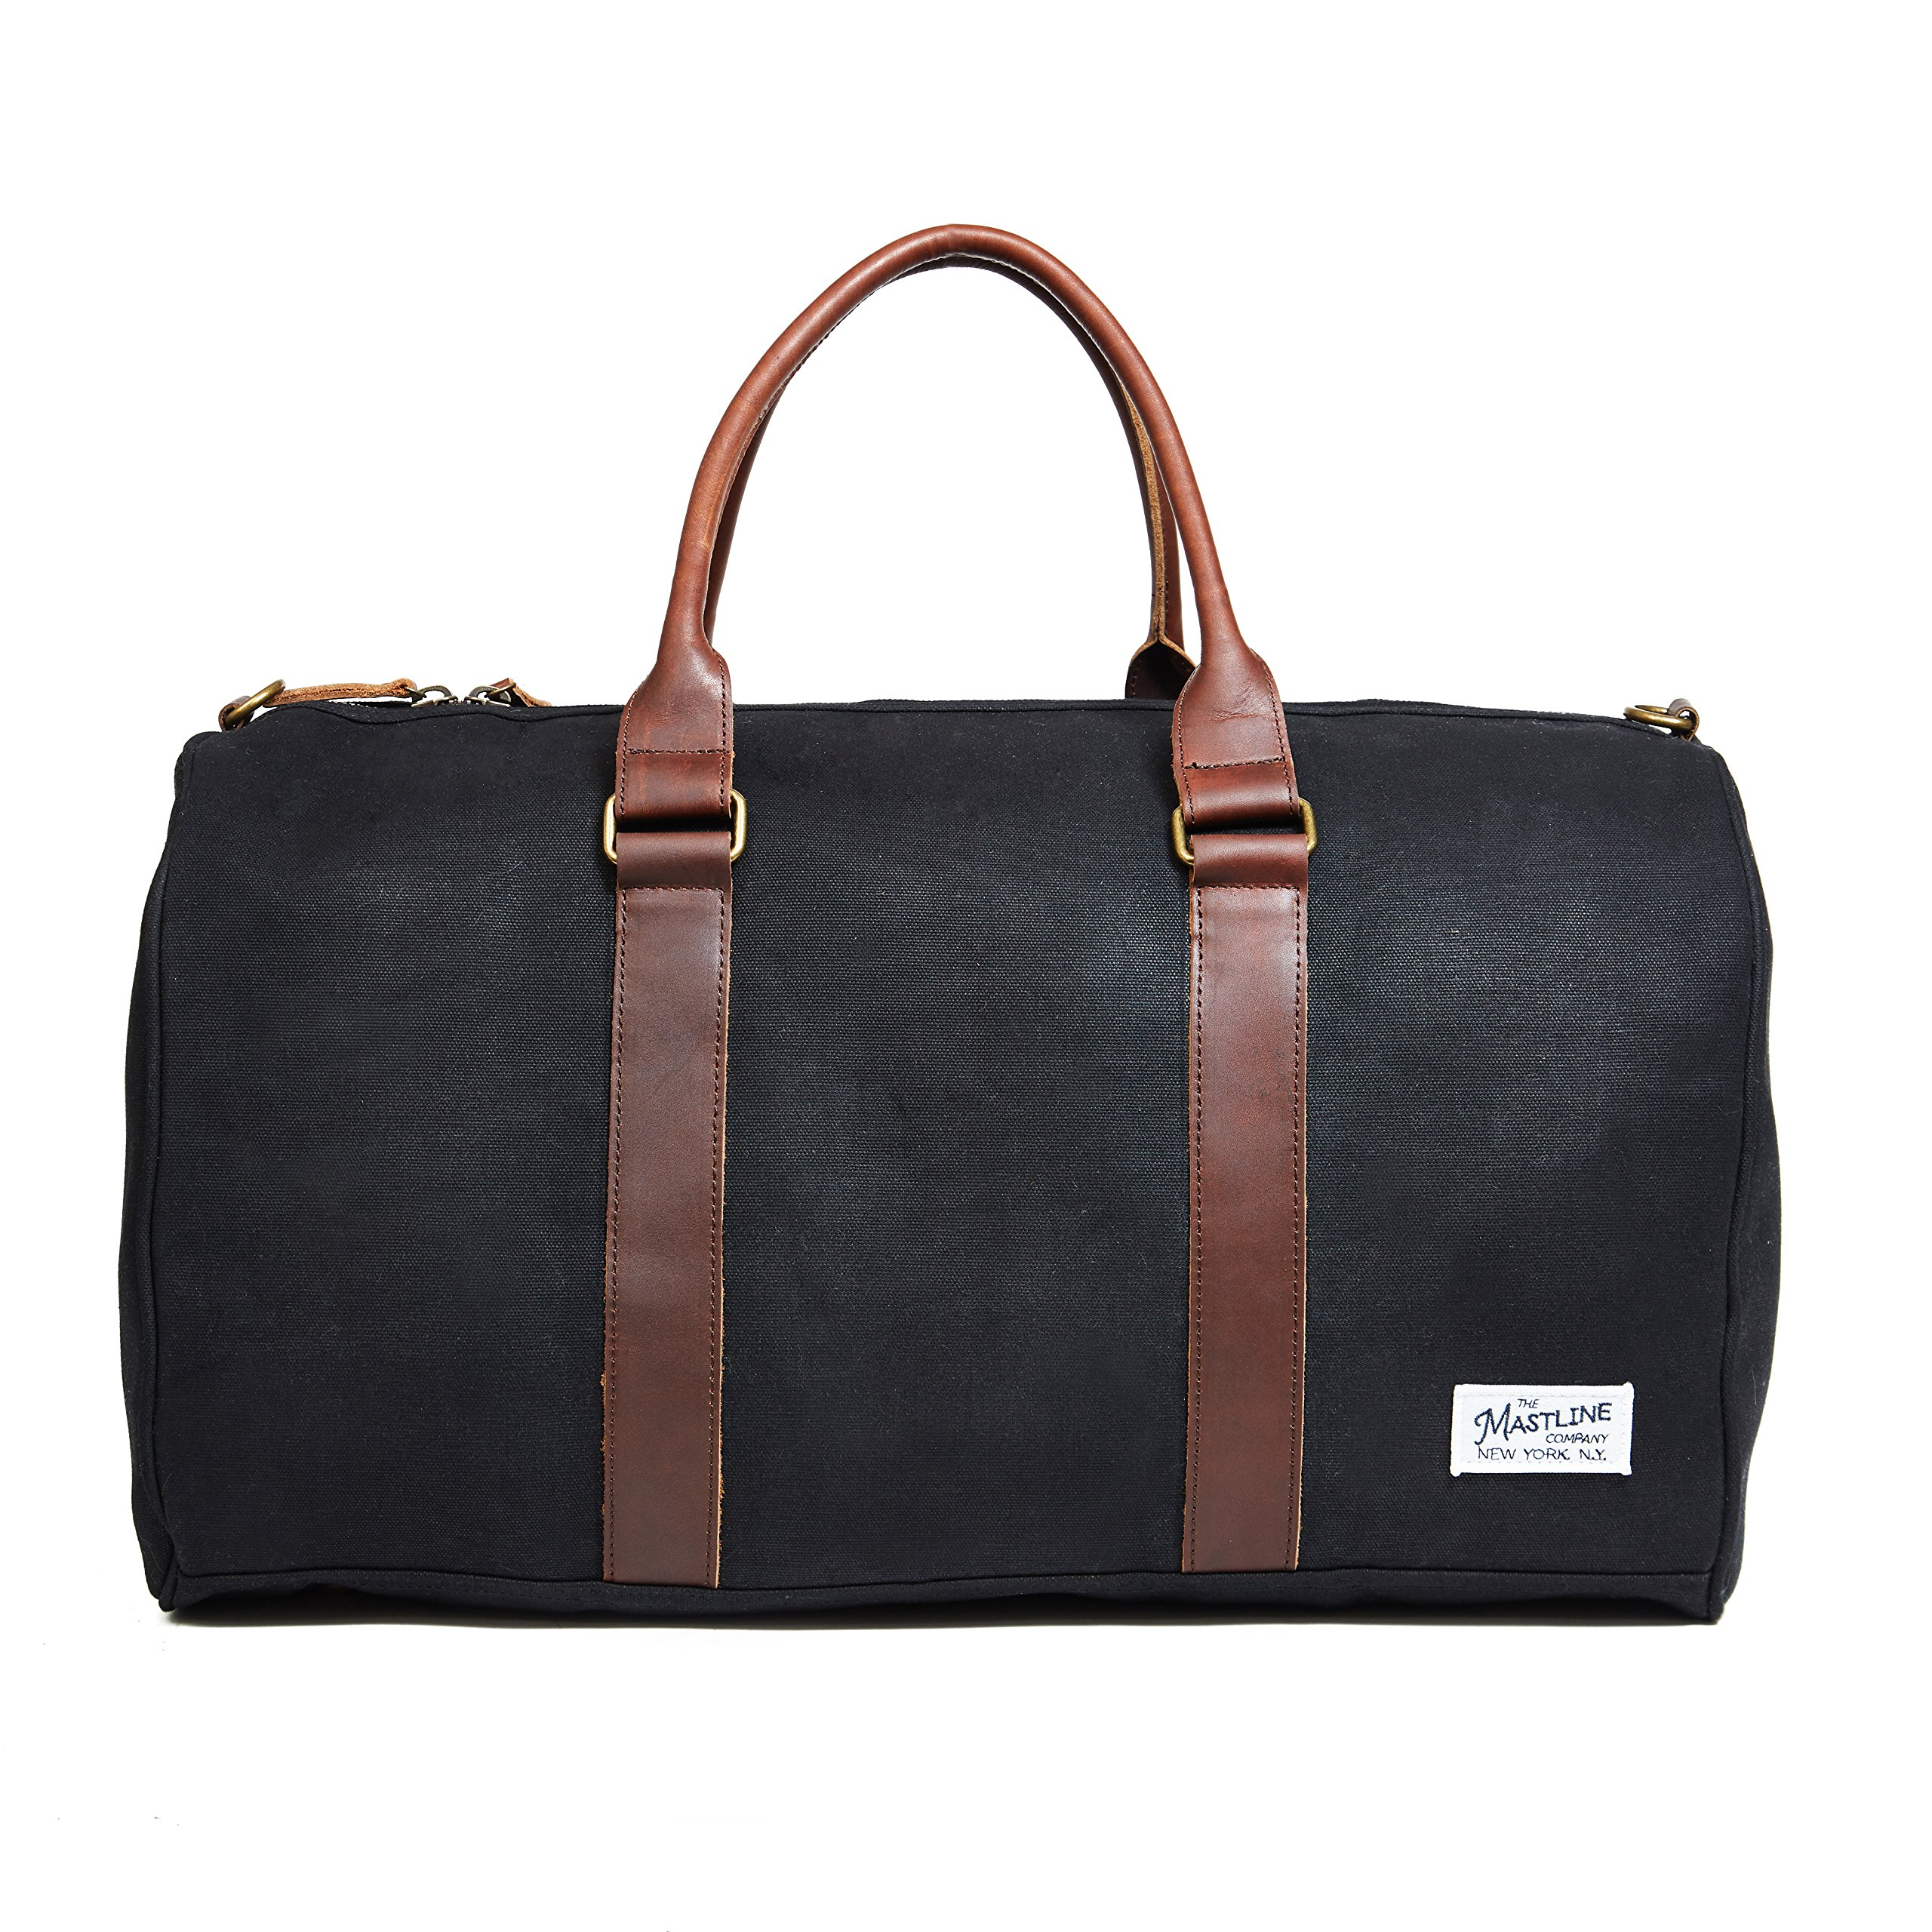 THE MASTLINE Co. | Fulton Weekender Travel Bag | Waxed Canvas & Leather (Black)